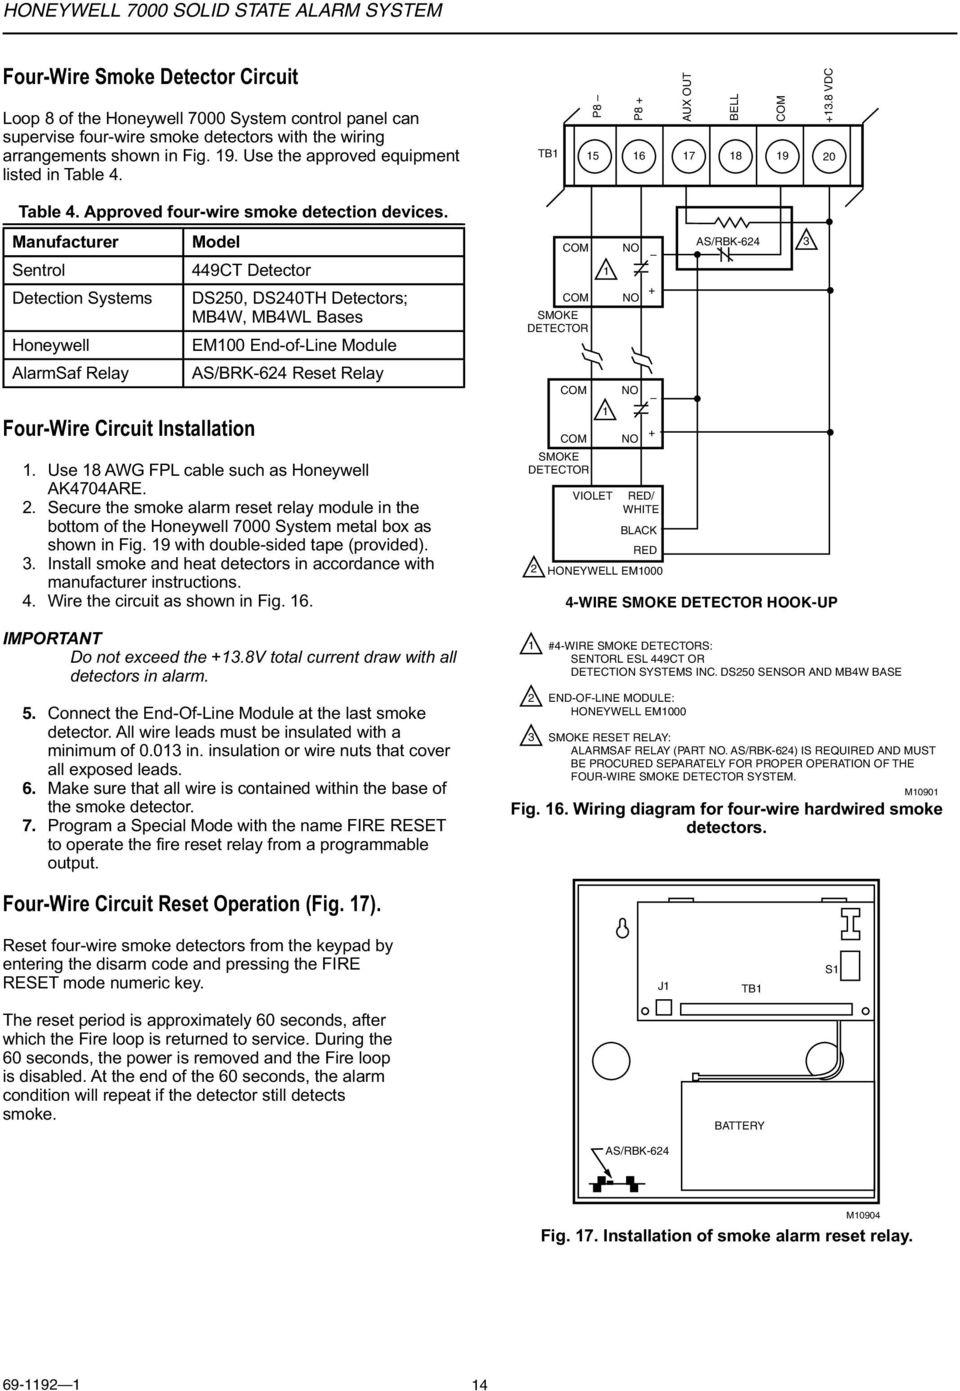 Fb 6481 Esl Smoke Detector Wiring Diagram Get Free Image About Wiring Schematic Wiring